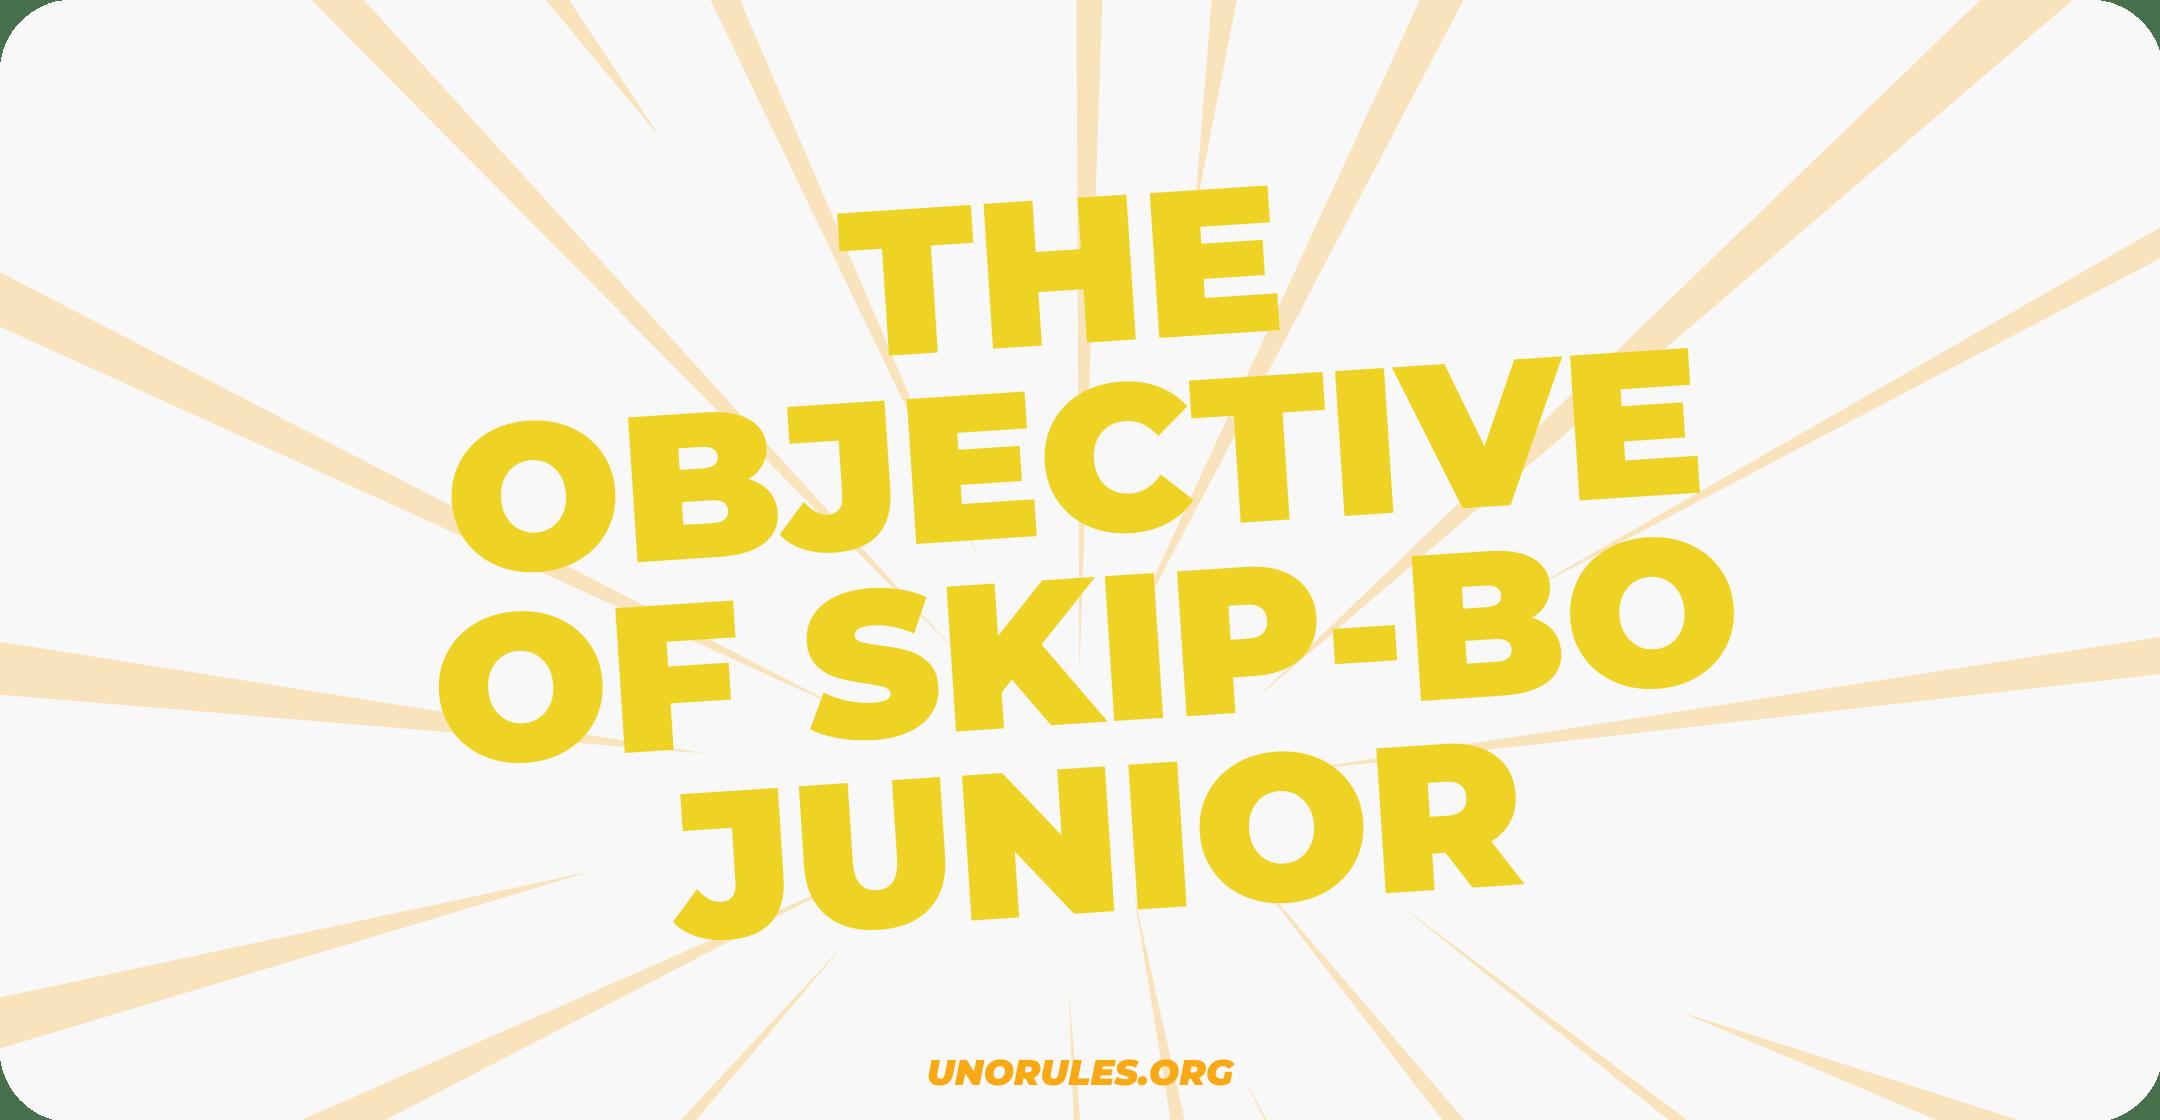 The objective of Skip-Bo junior